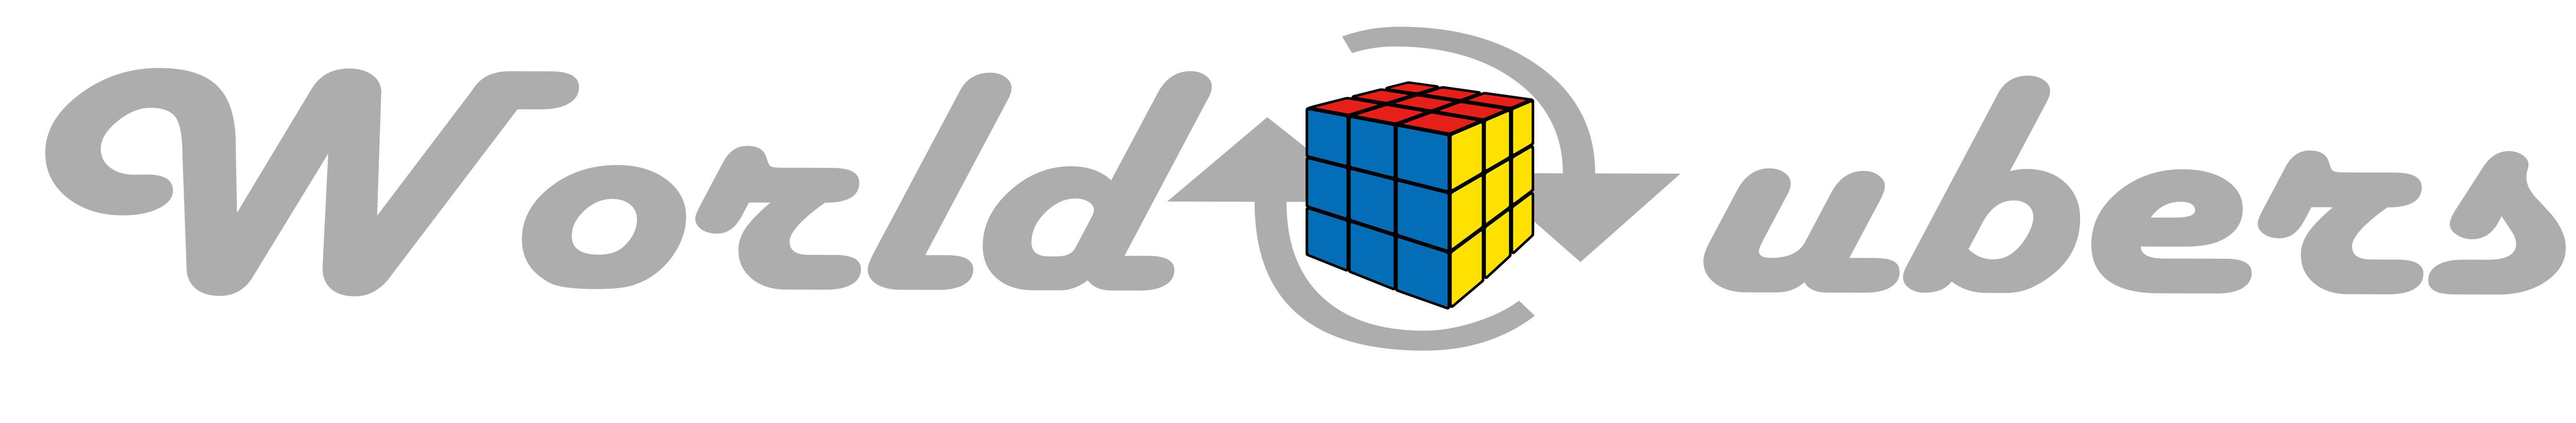 Cubers Social Network Logo